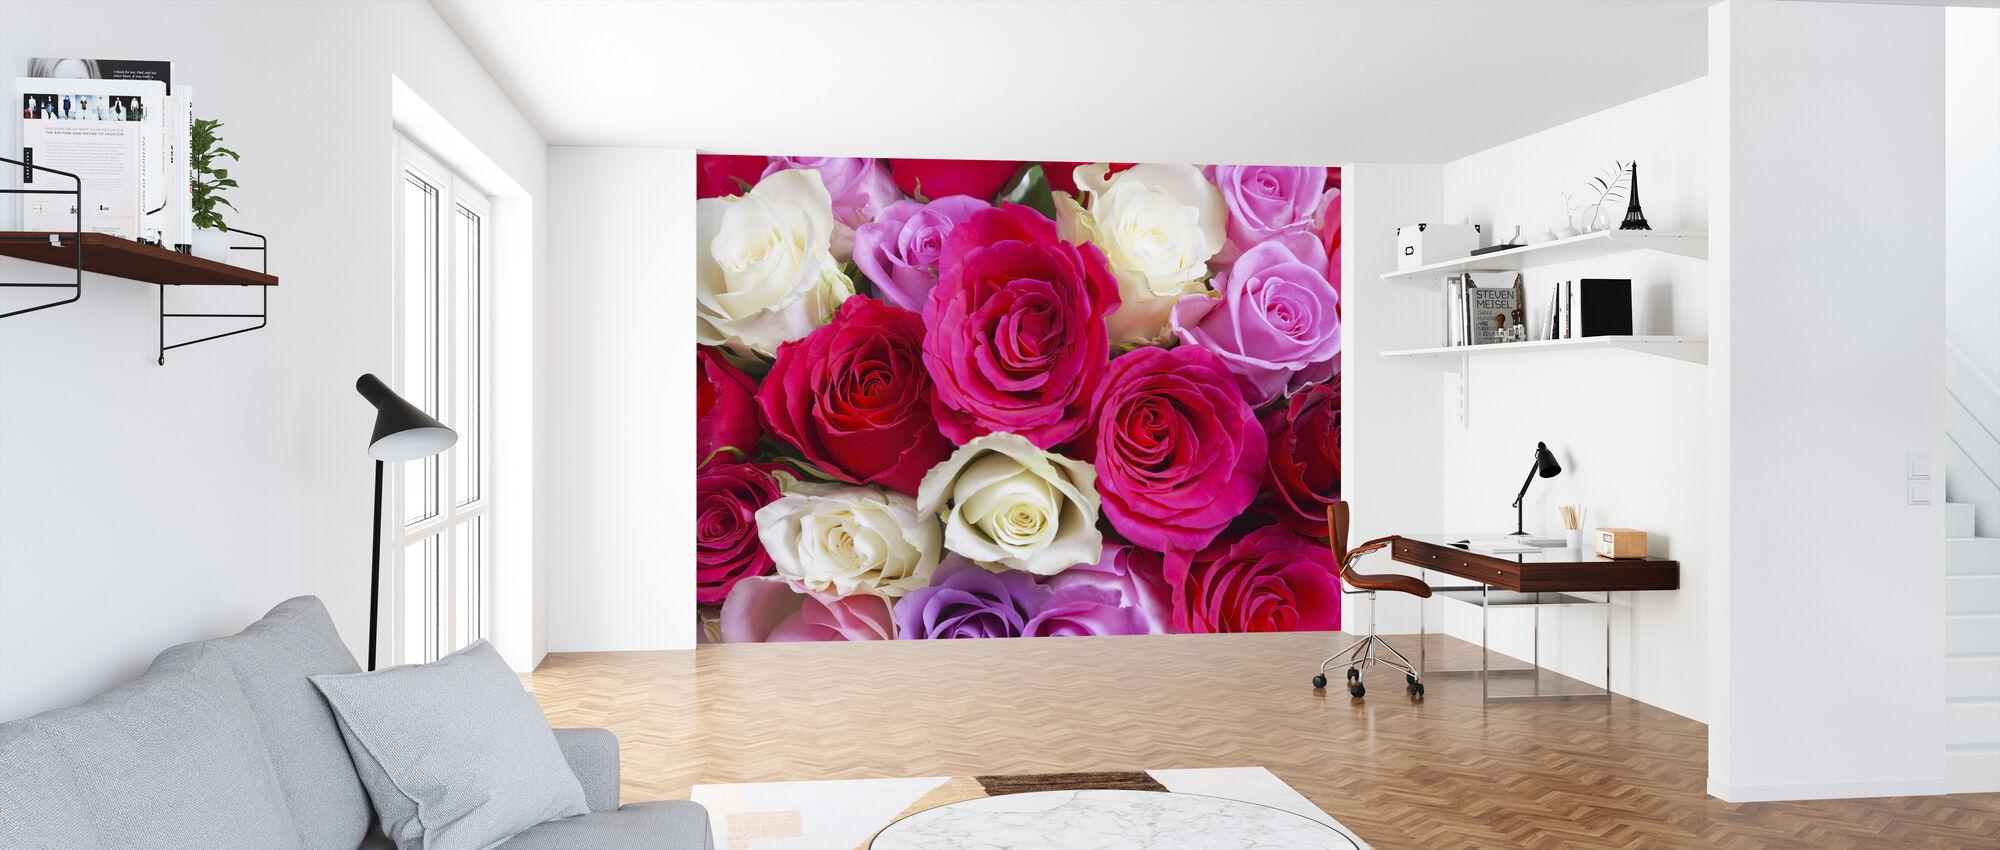 Smukke roser - Tapet - Kontor